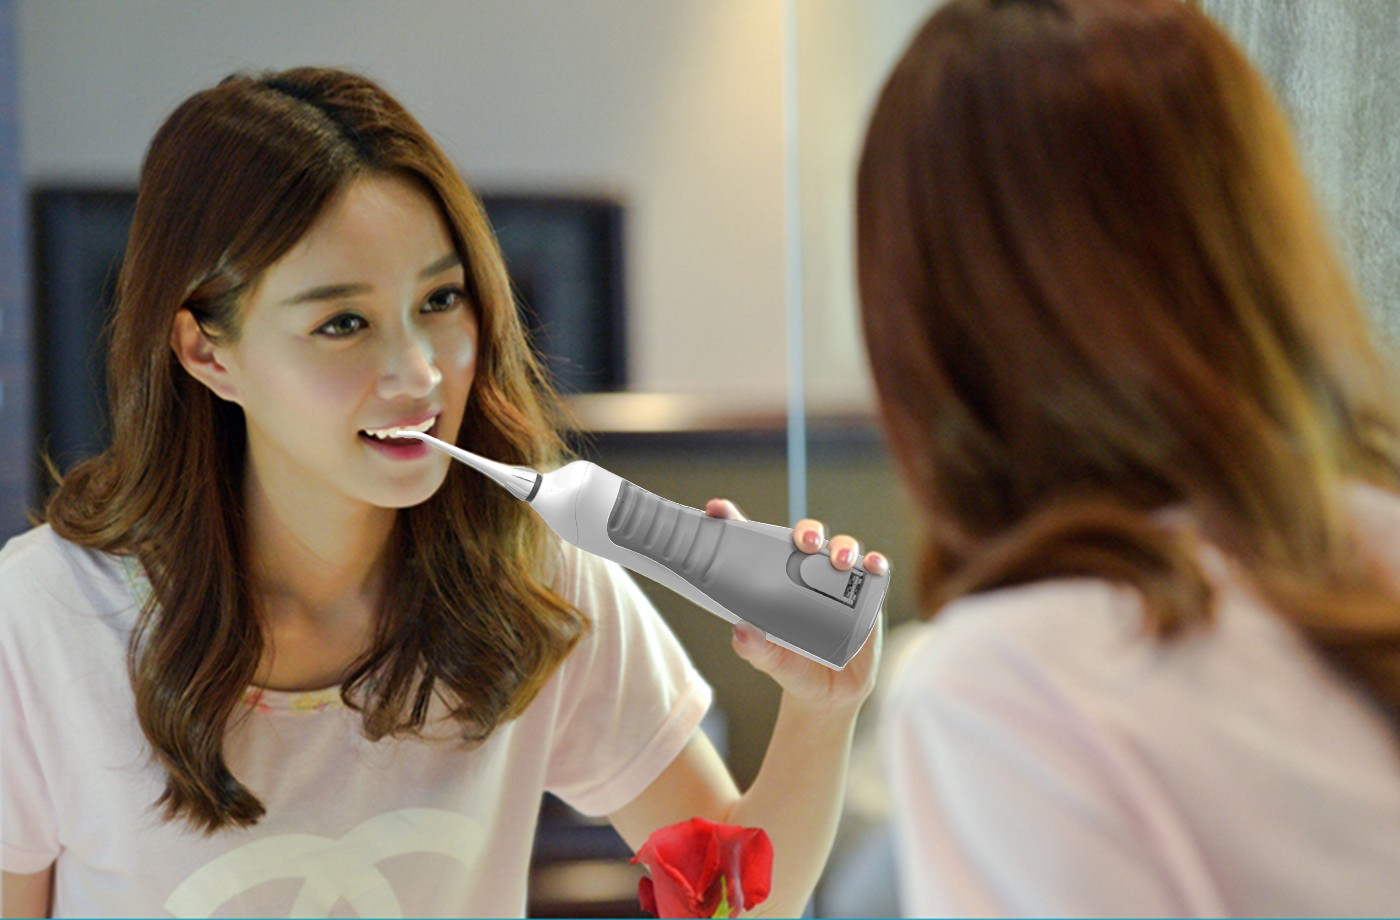 Woman using an oral irrigator